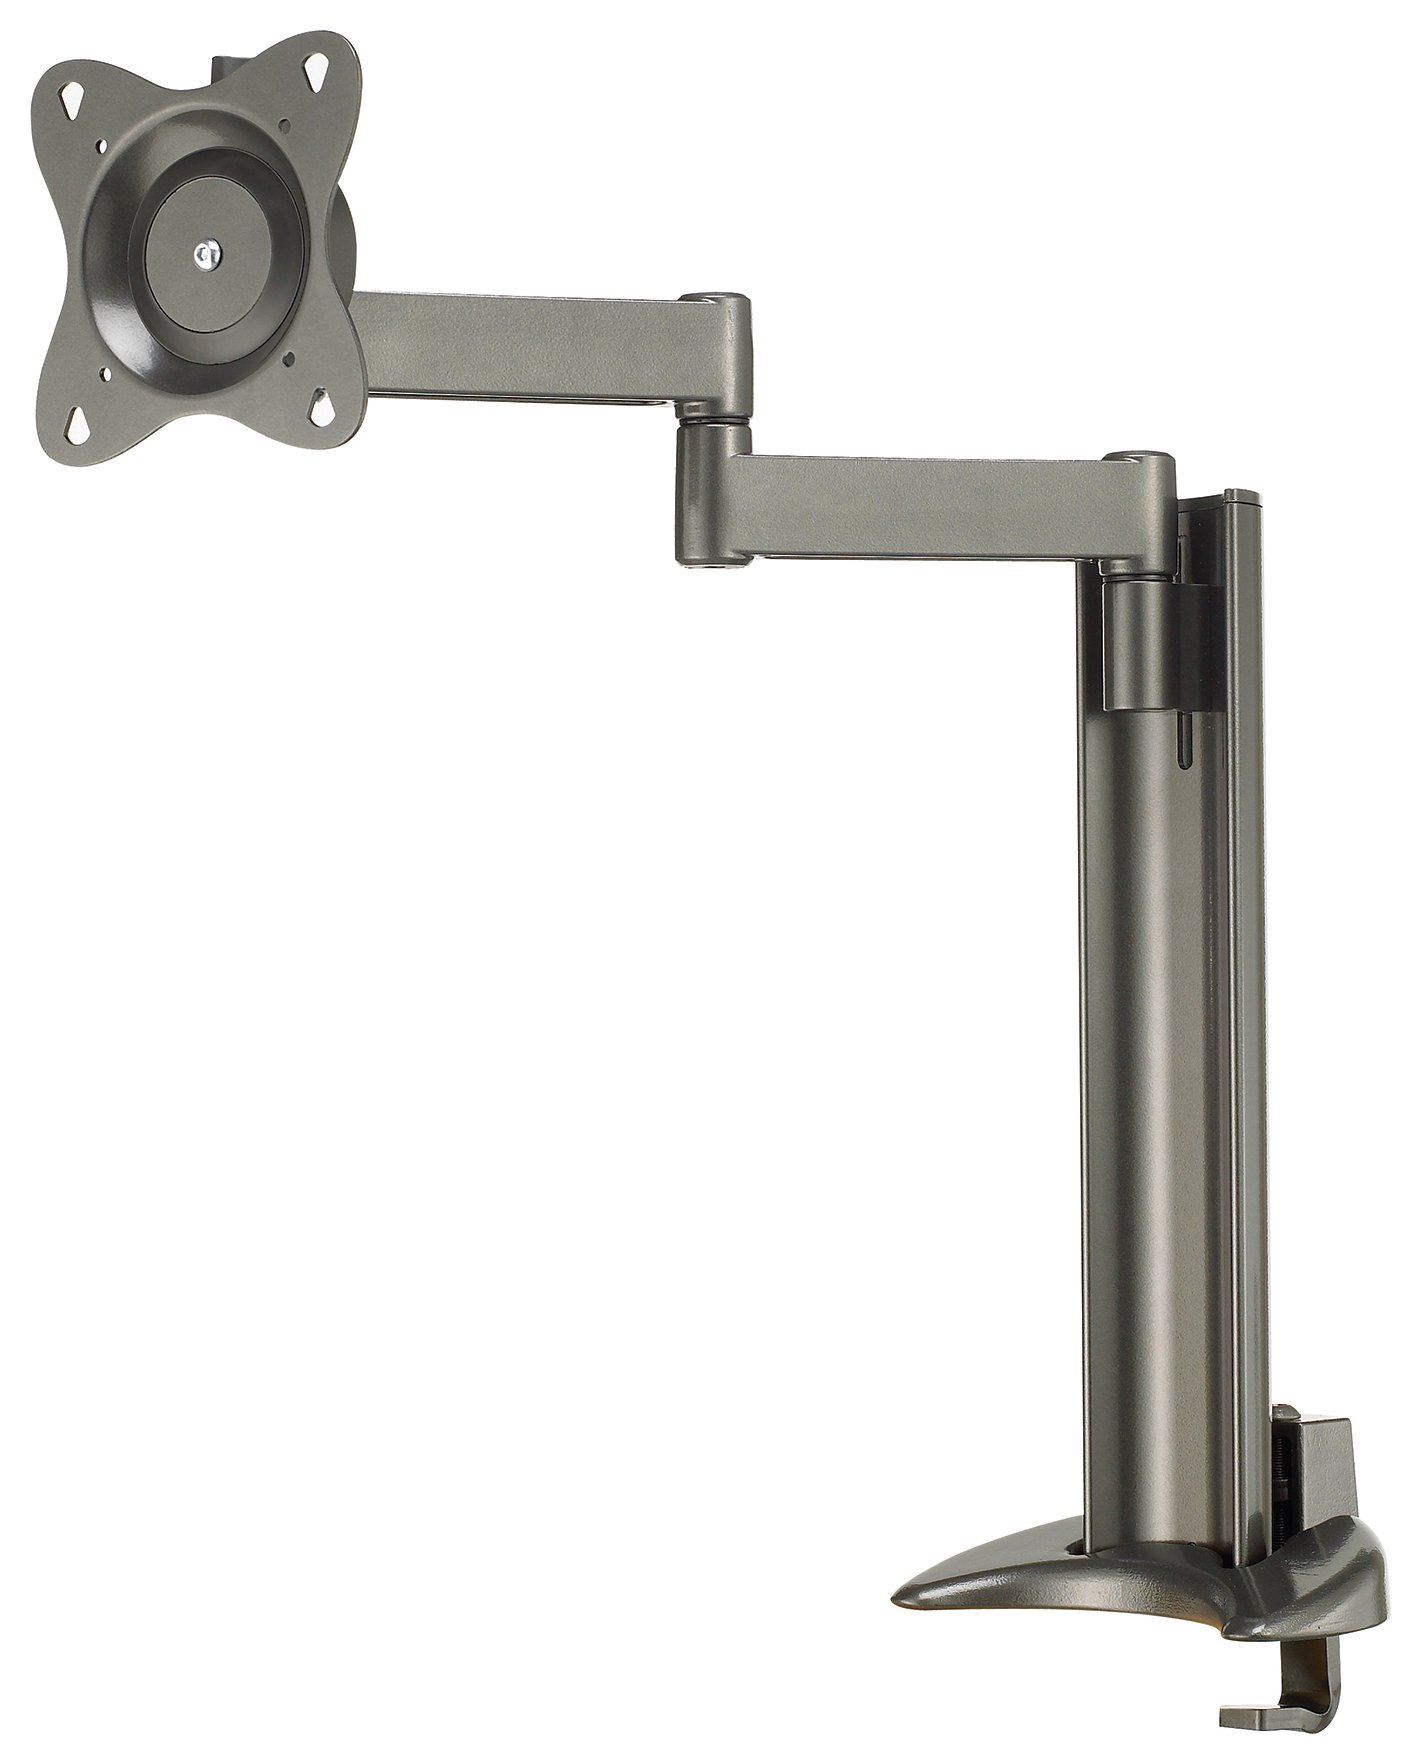 Sanus premium Sanus MD115 Full Motion Desk Mount Up To 30 Inch Monitors.